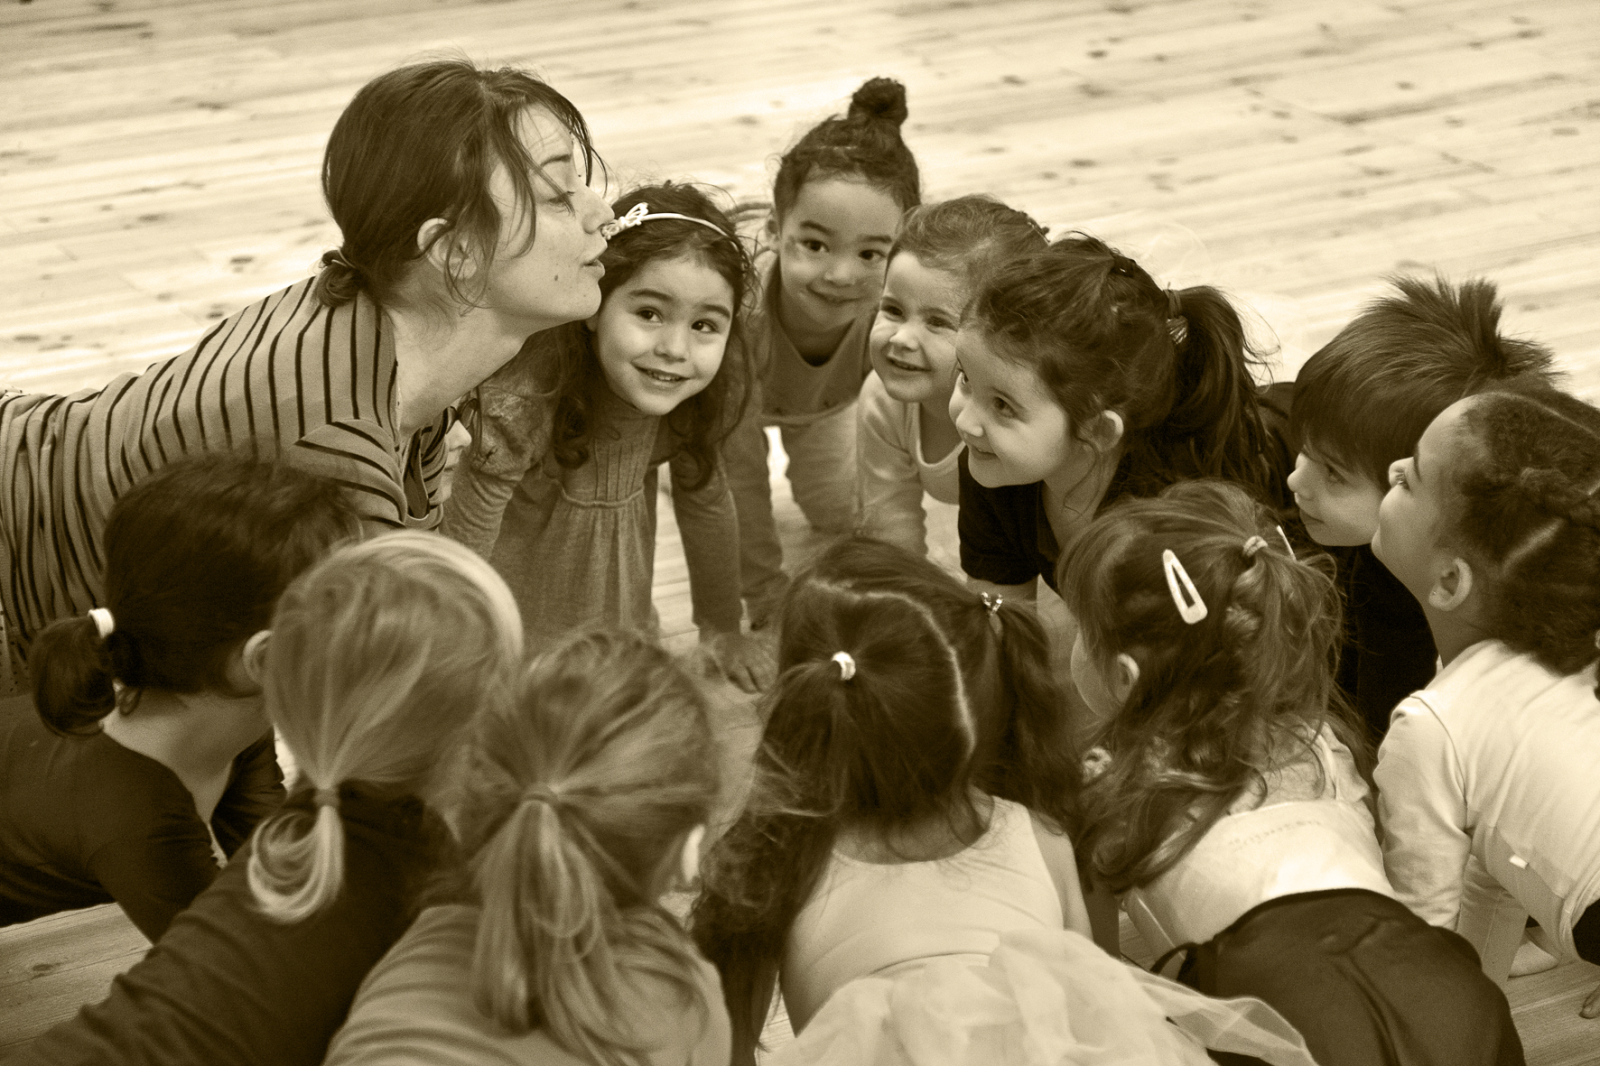 Eveil Corporel danse 4-6 ans mercredi après-midi - Association Bagas Héritage